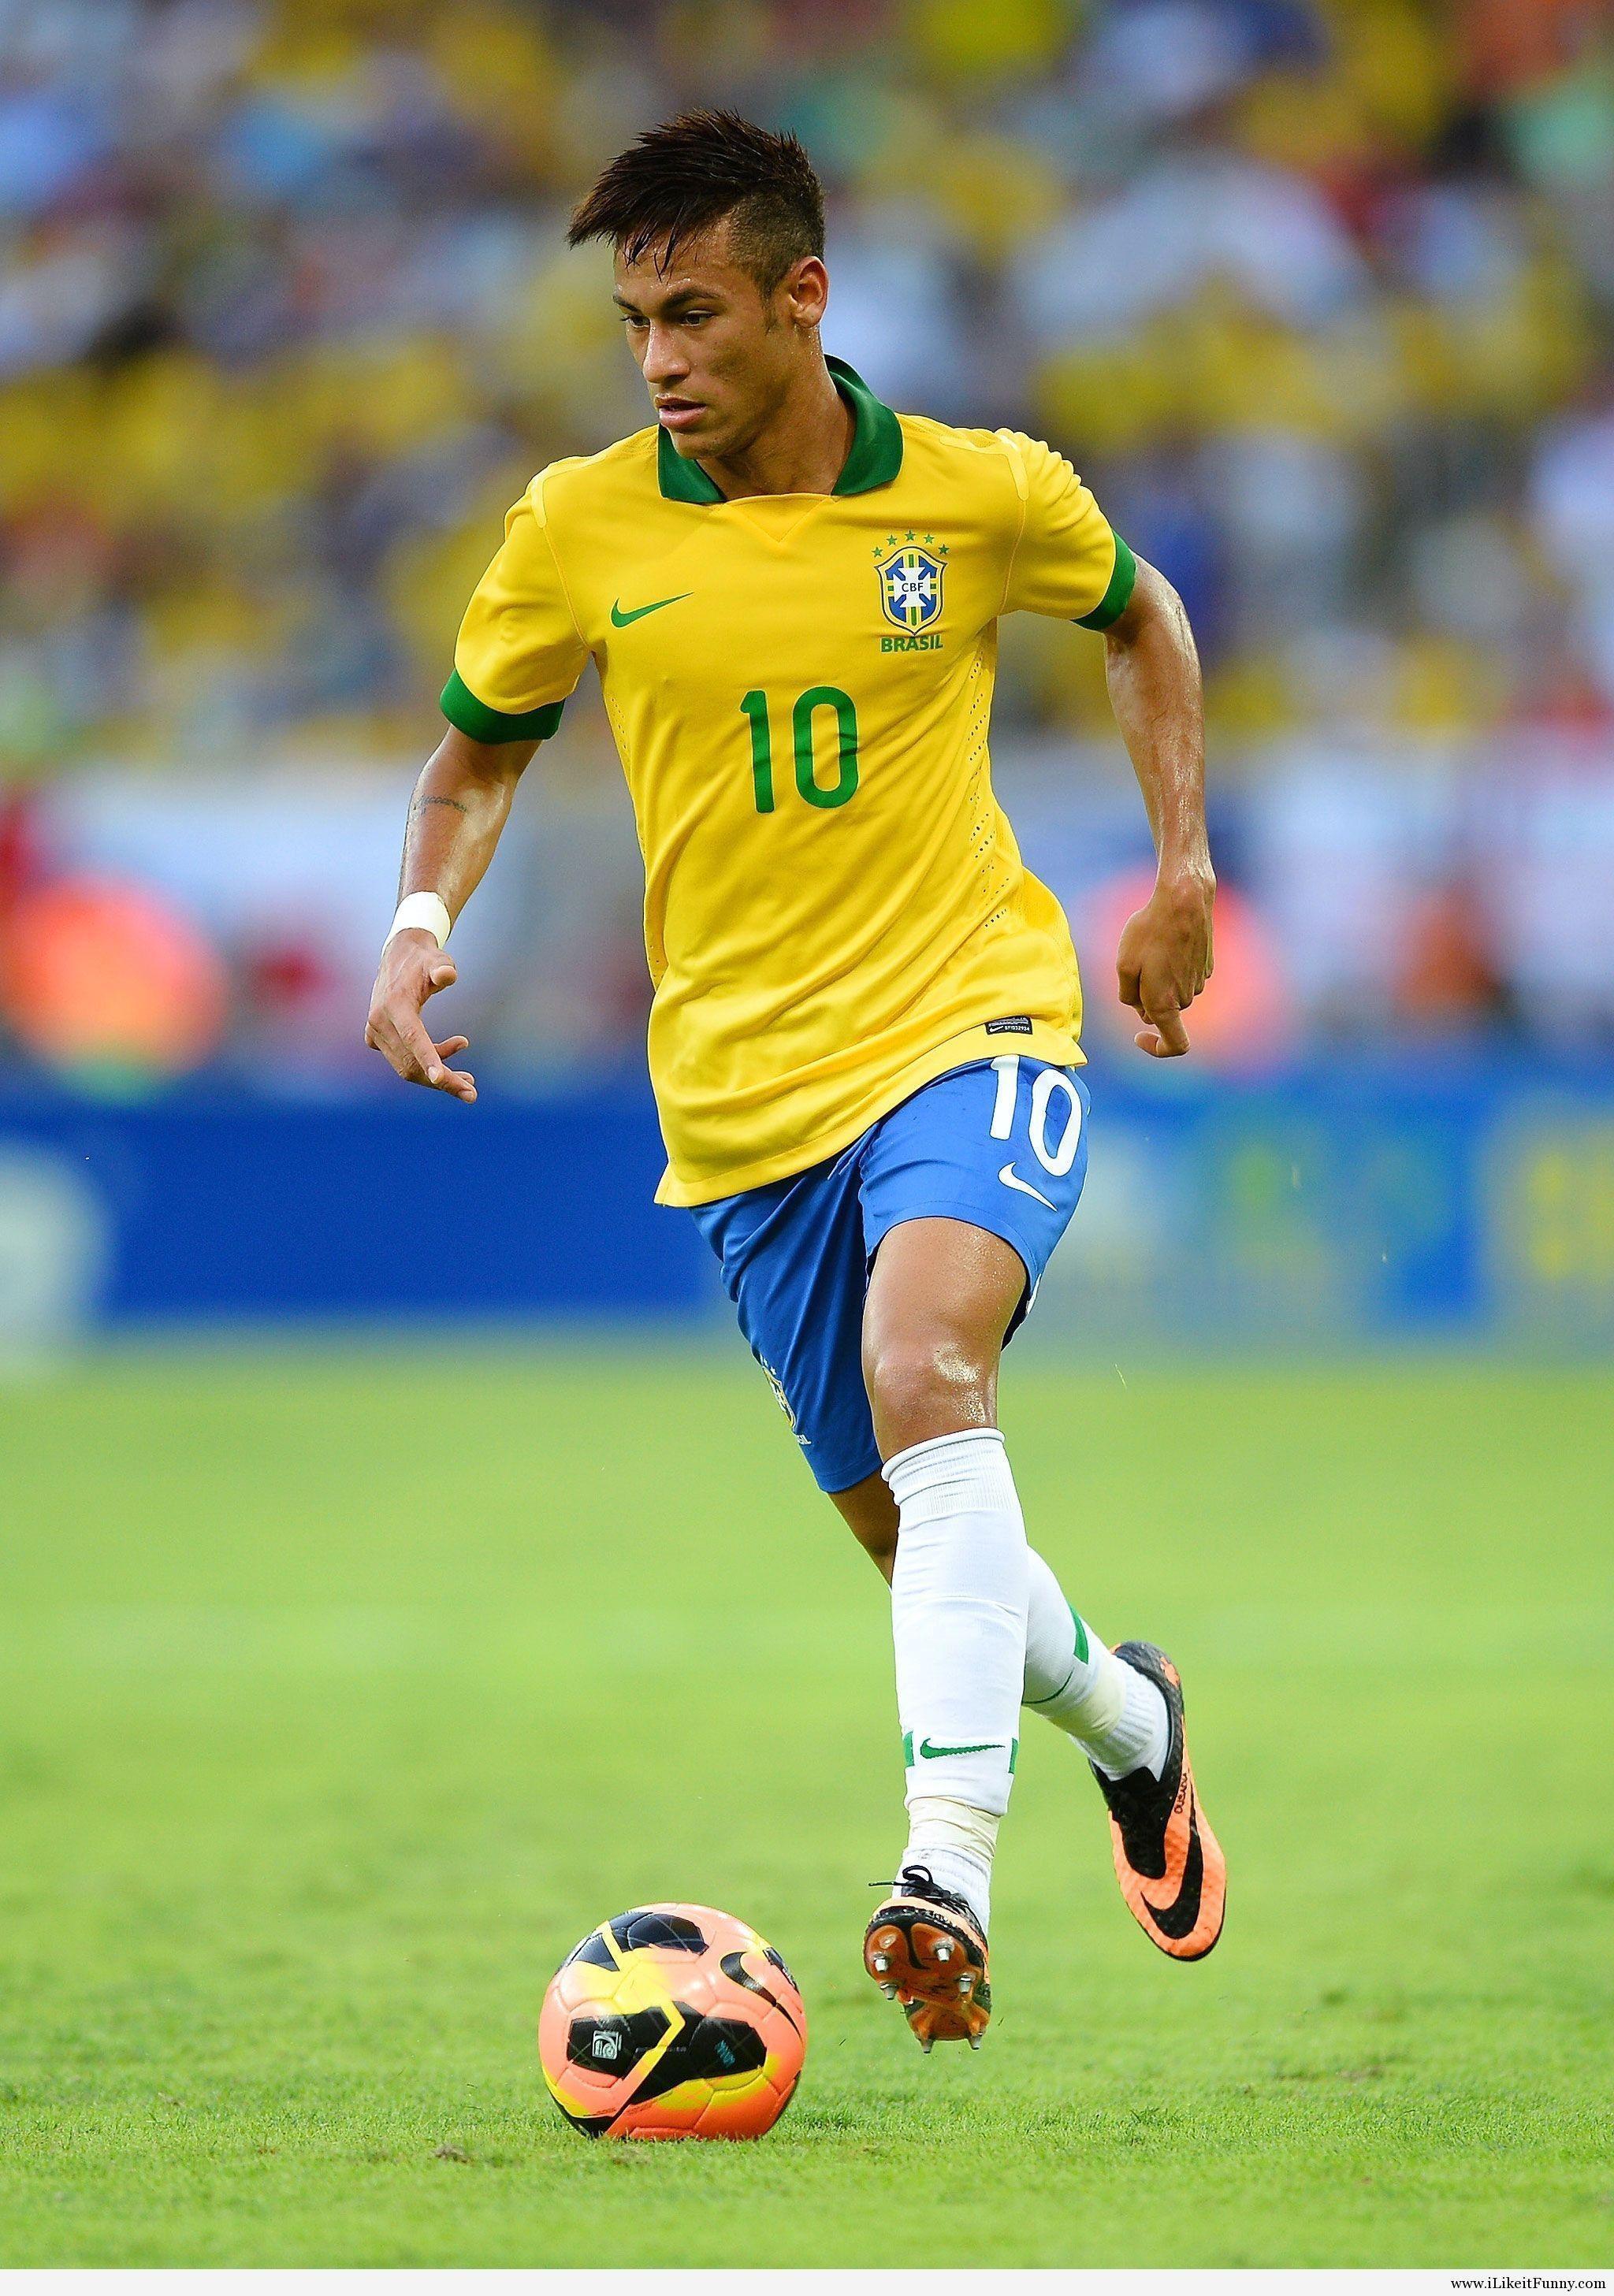 Neymar Jr Hd Photos Brazil - Neymar Brazil Wallpapers Top ...